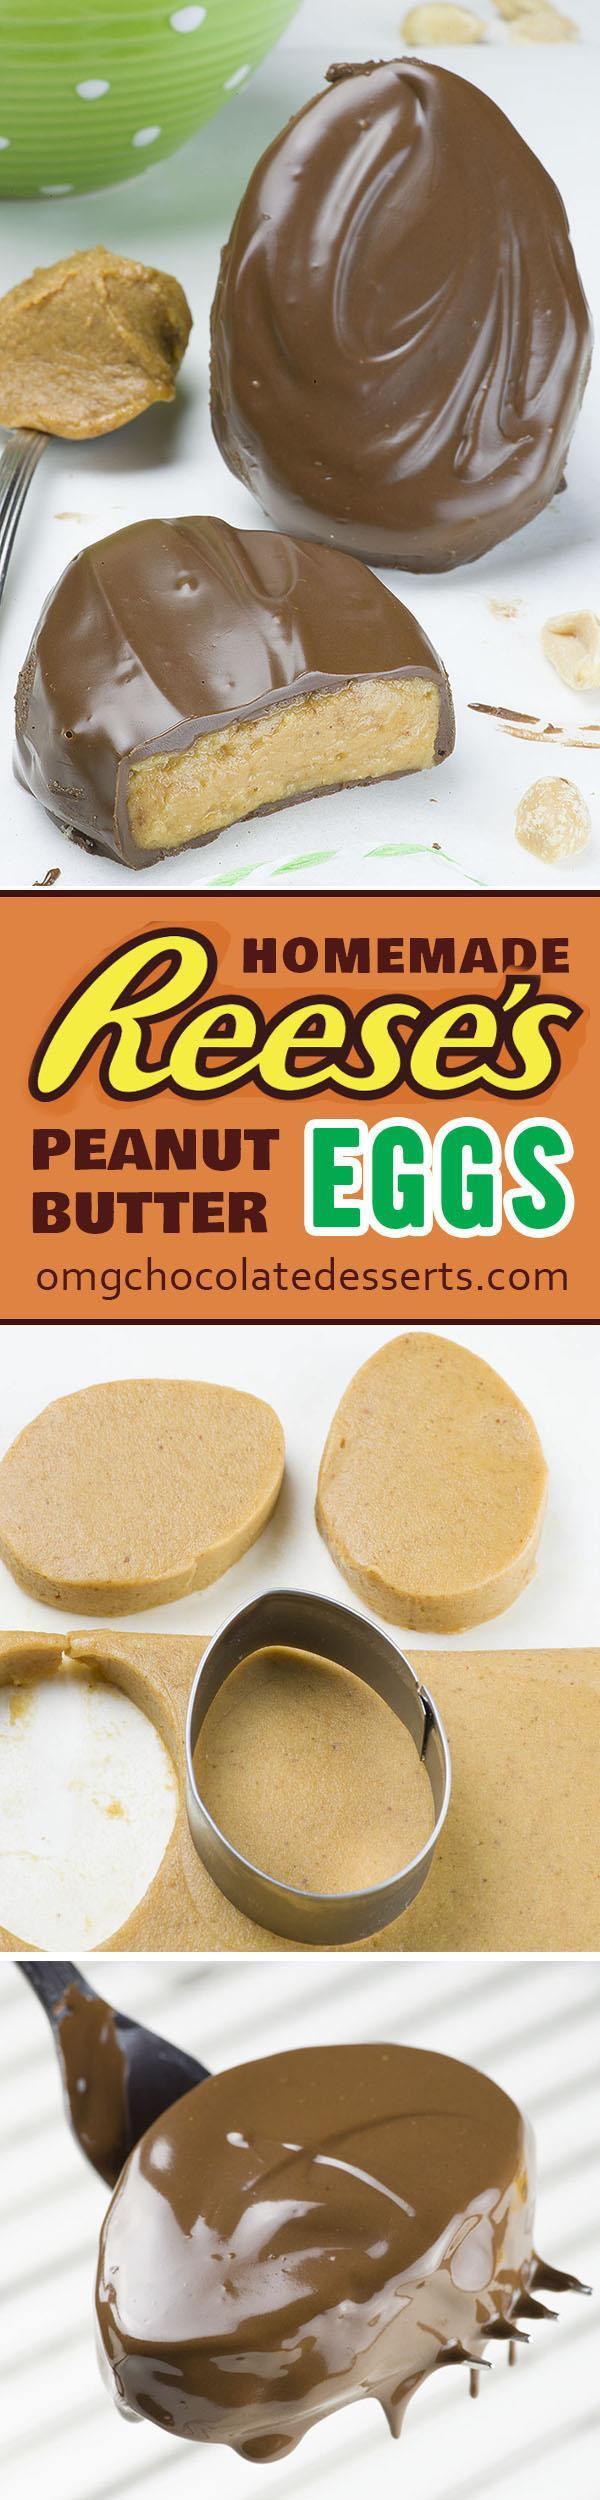 No Eggs Dessert  Homemade Reese's Eggs